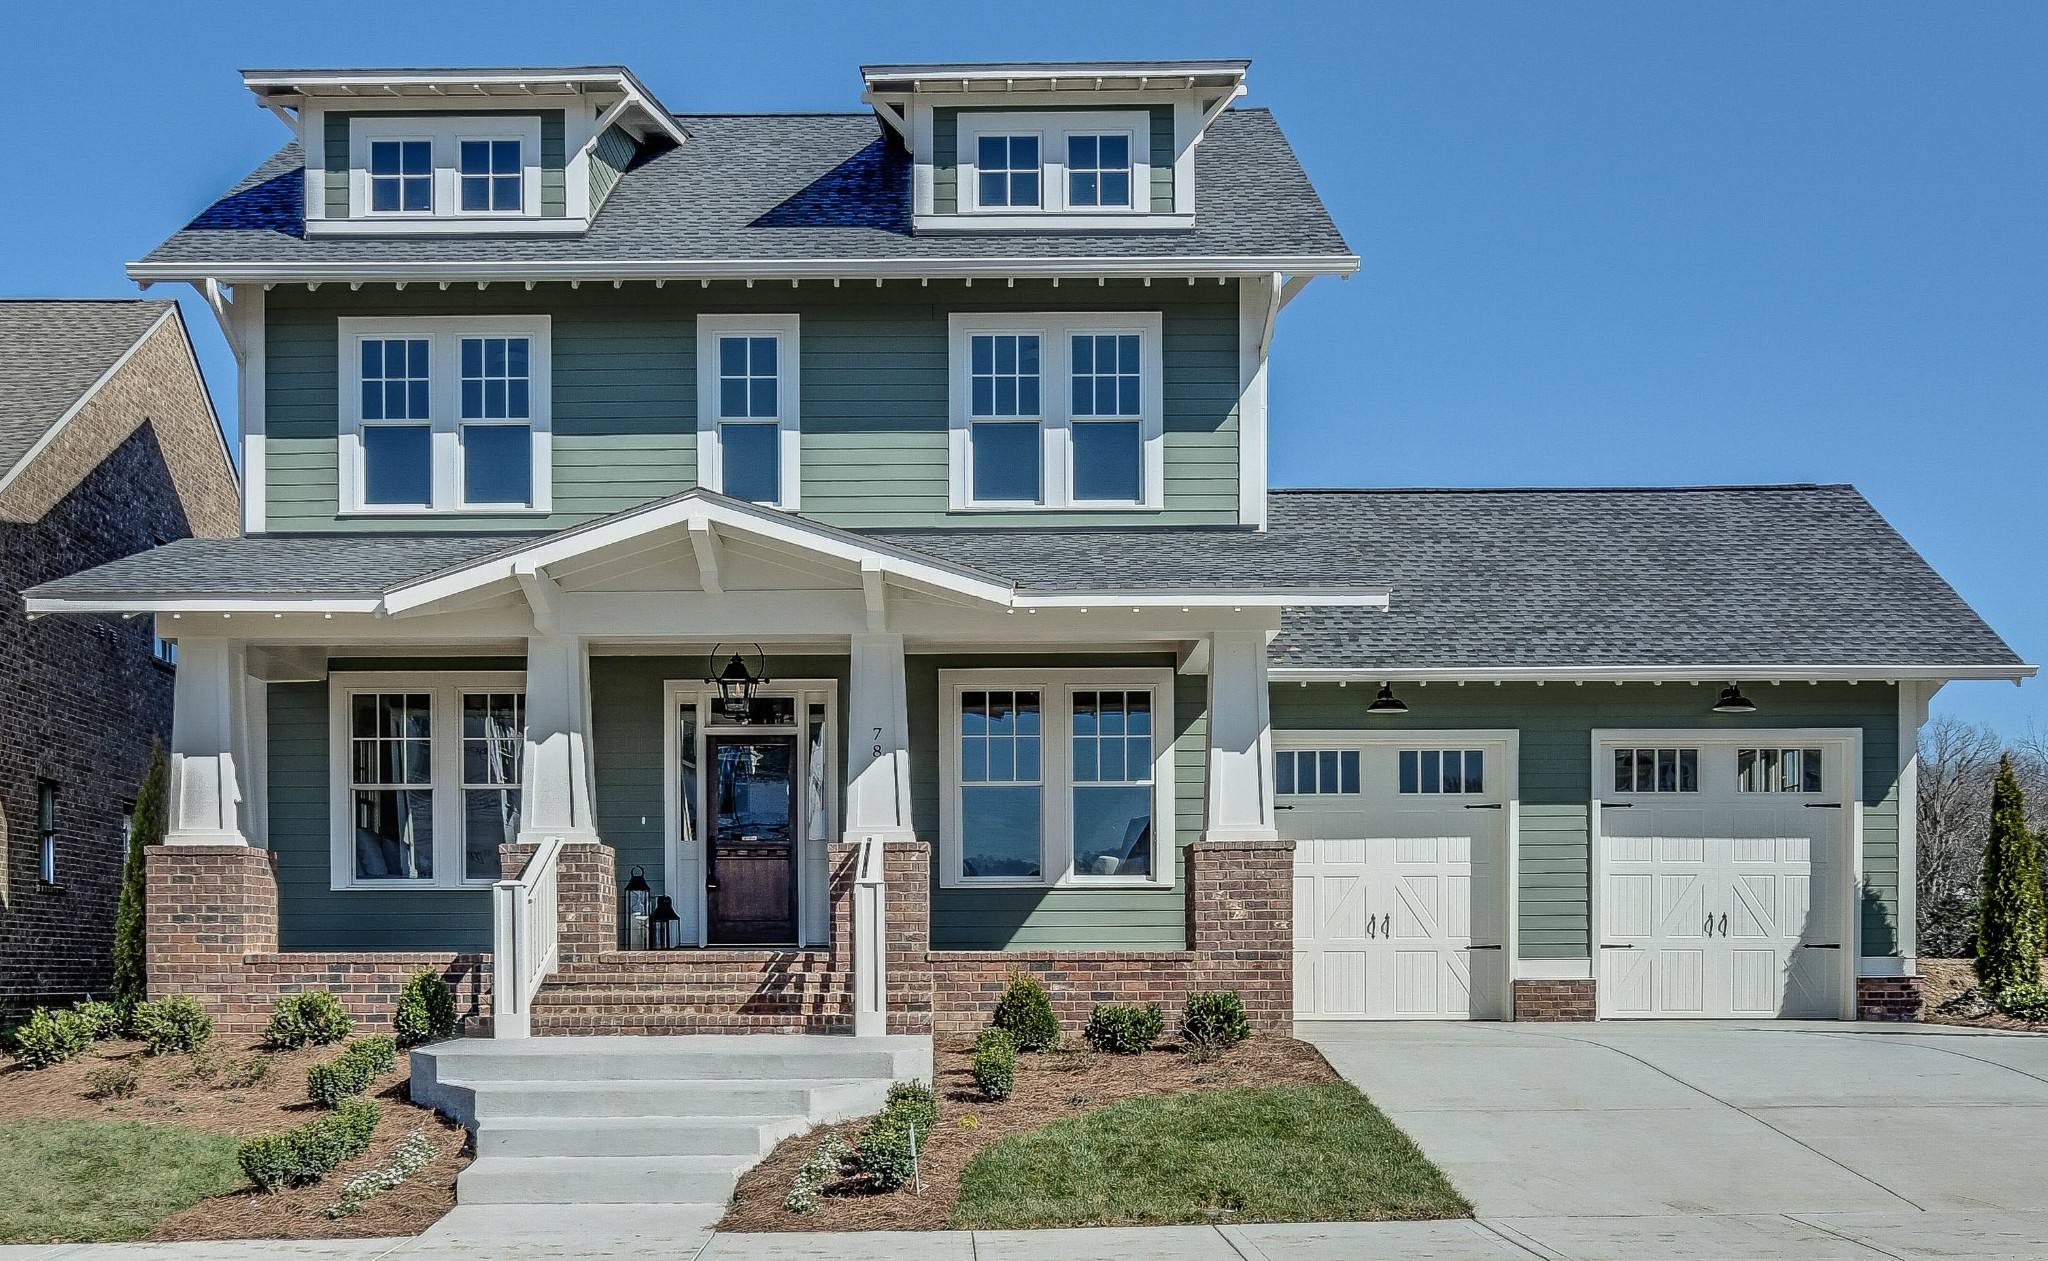 78 Glenrock Drive Lot 203, Nashville, TN 37221 - Nashville, TN real estate listing